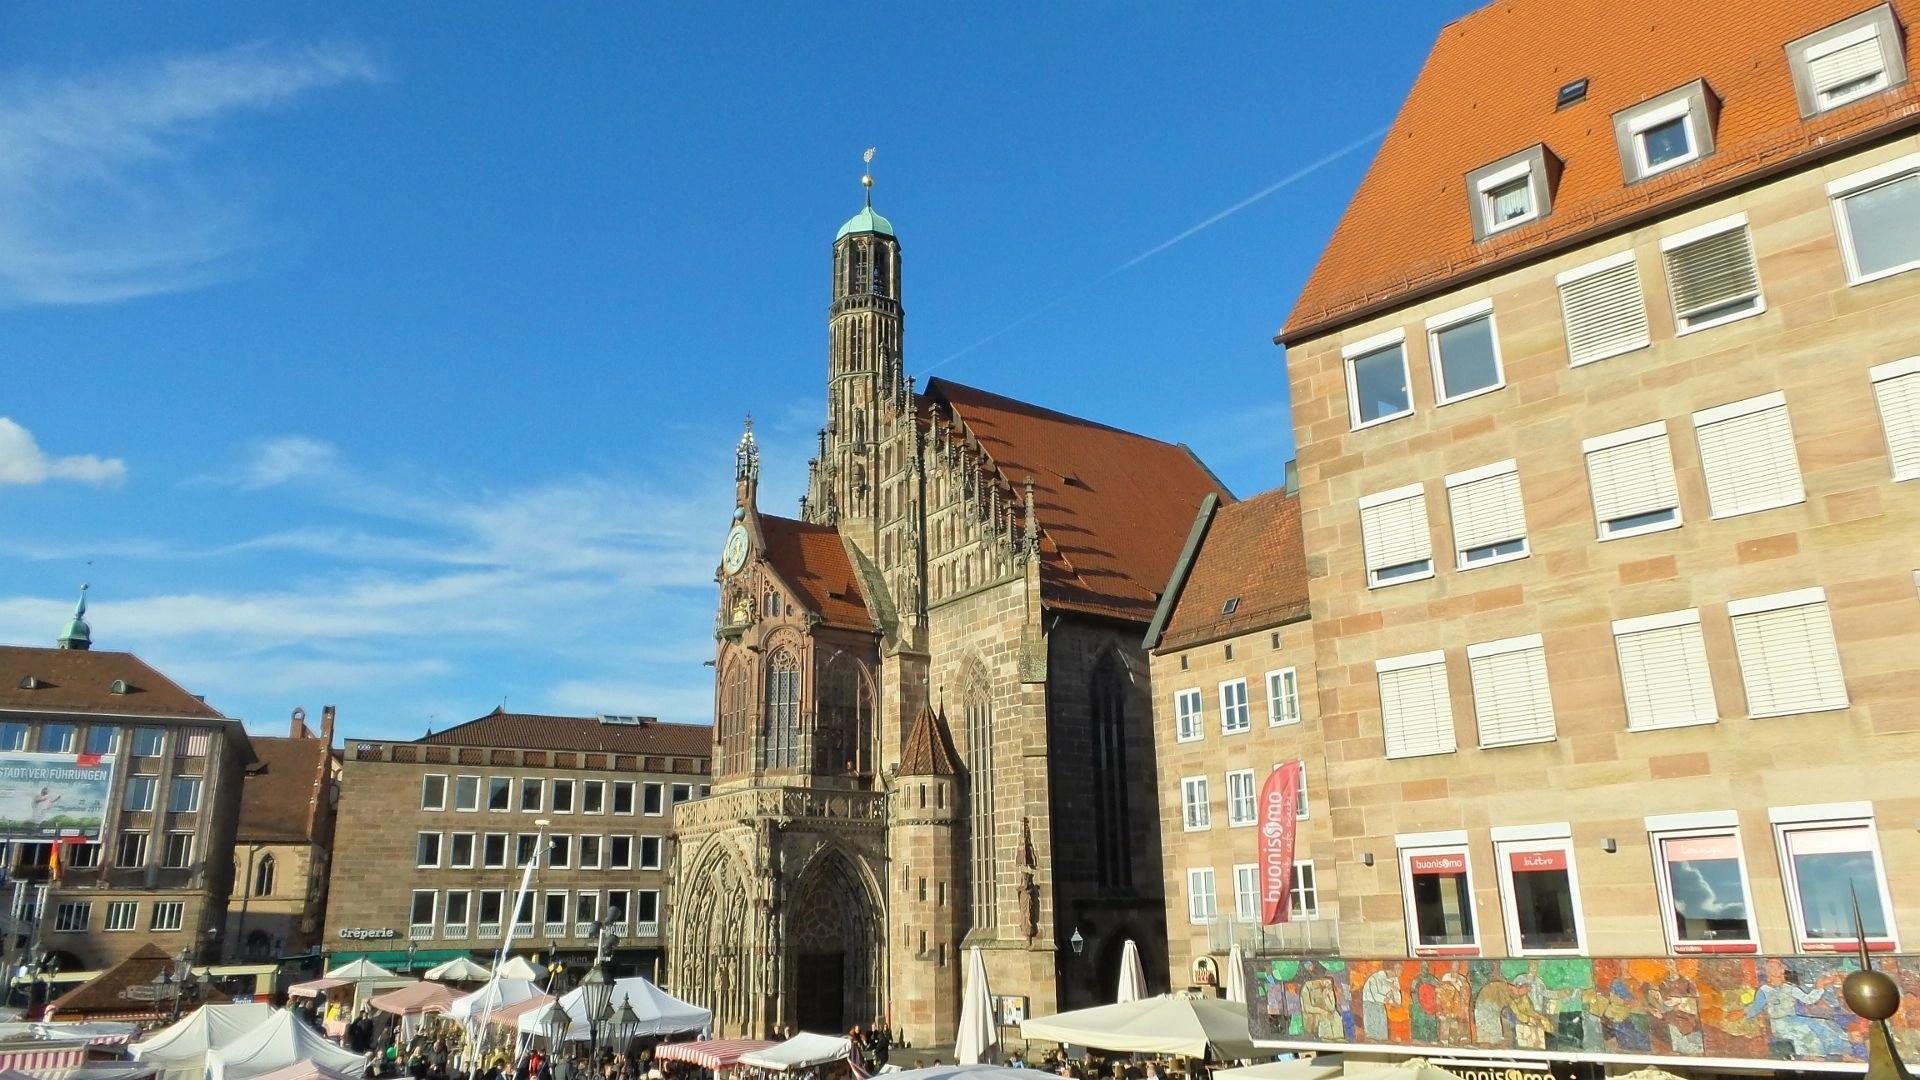 Church of Our Lady or Frauenkirche Nürnberg in NUremberg